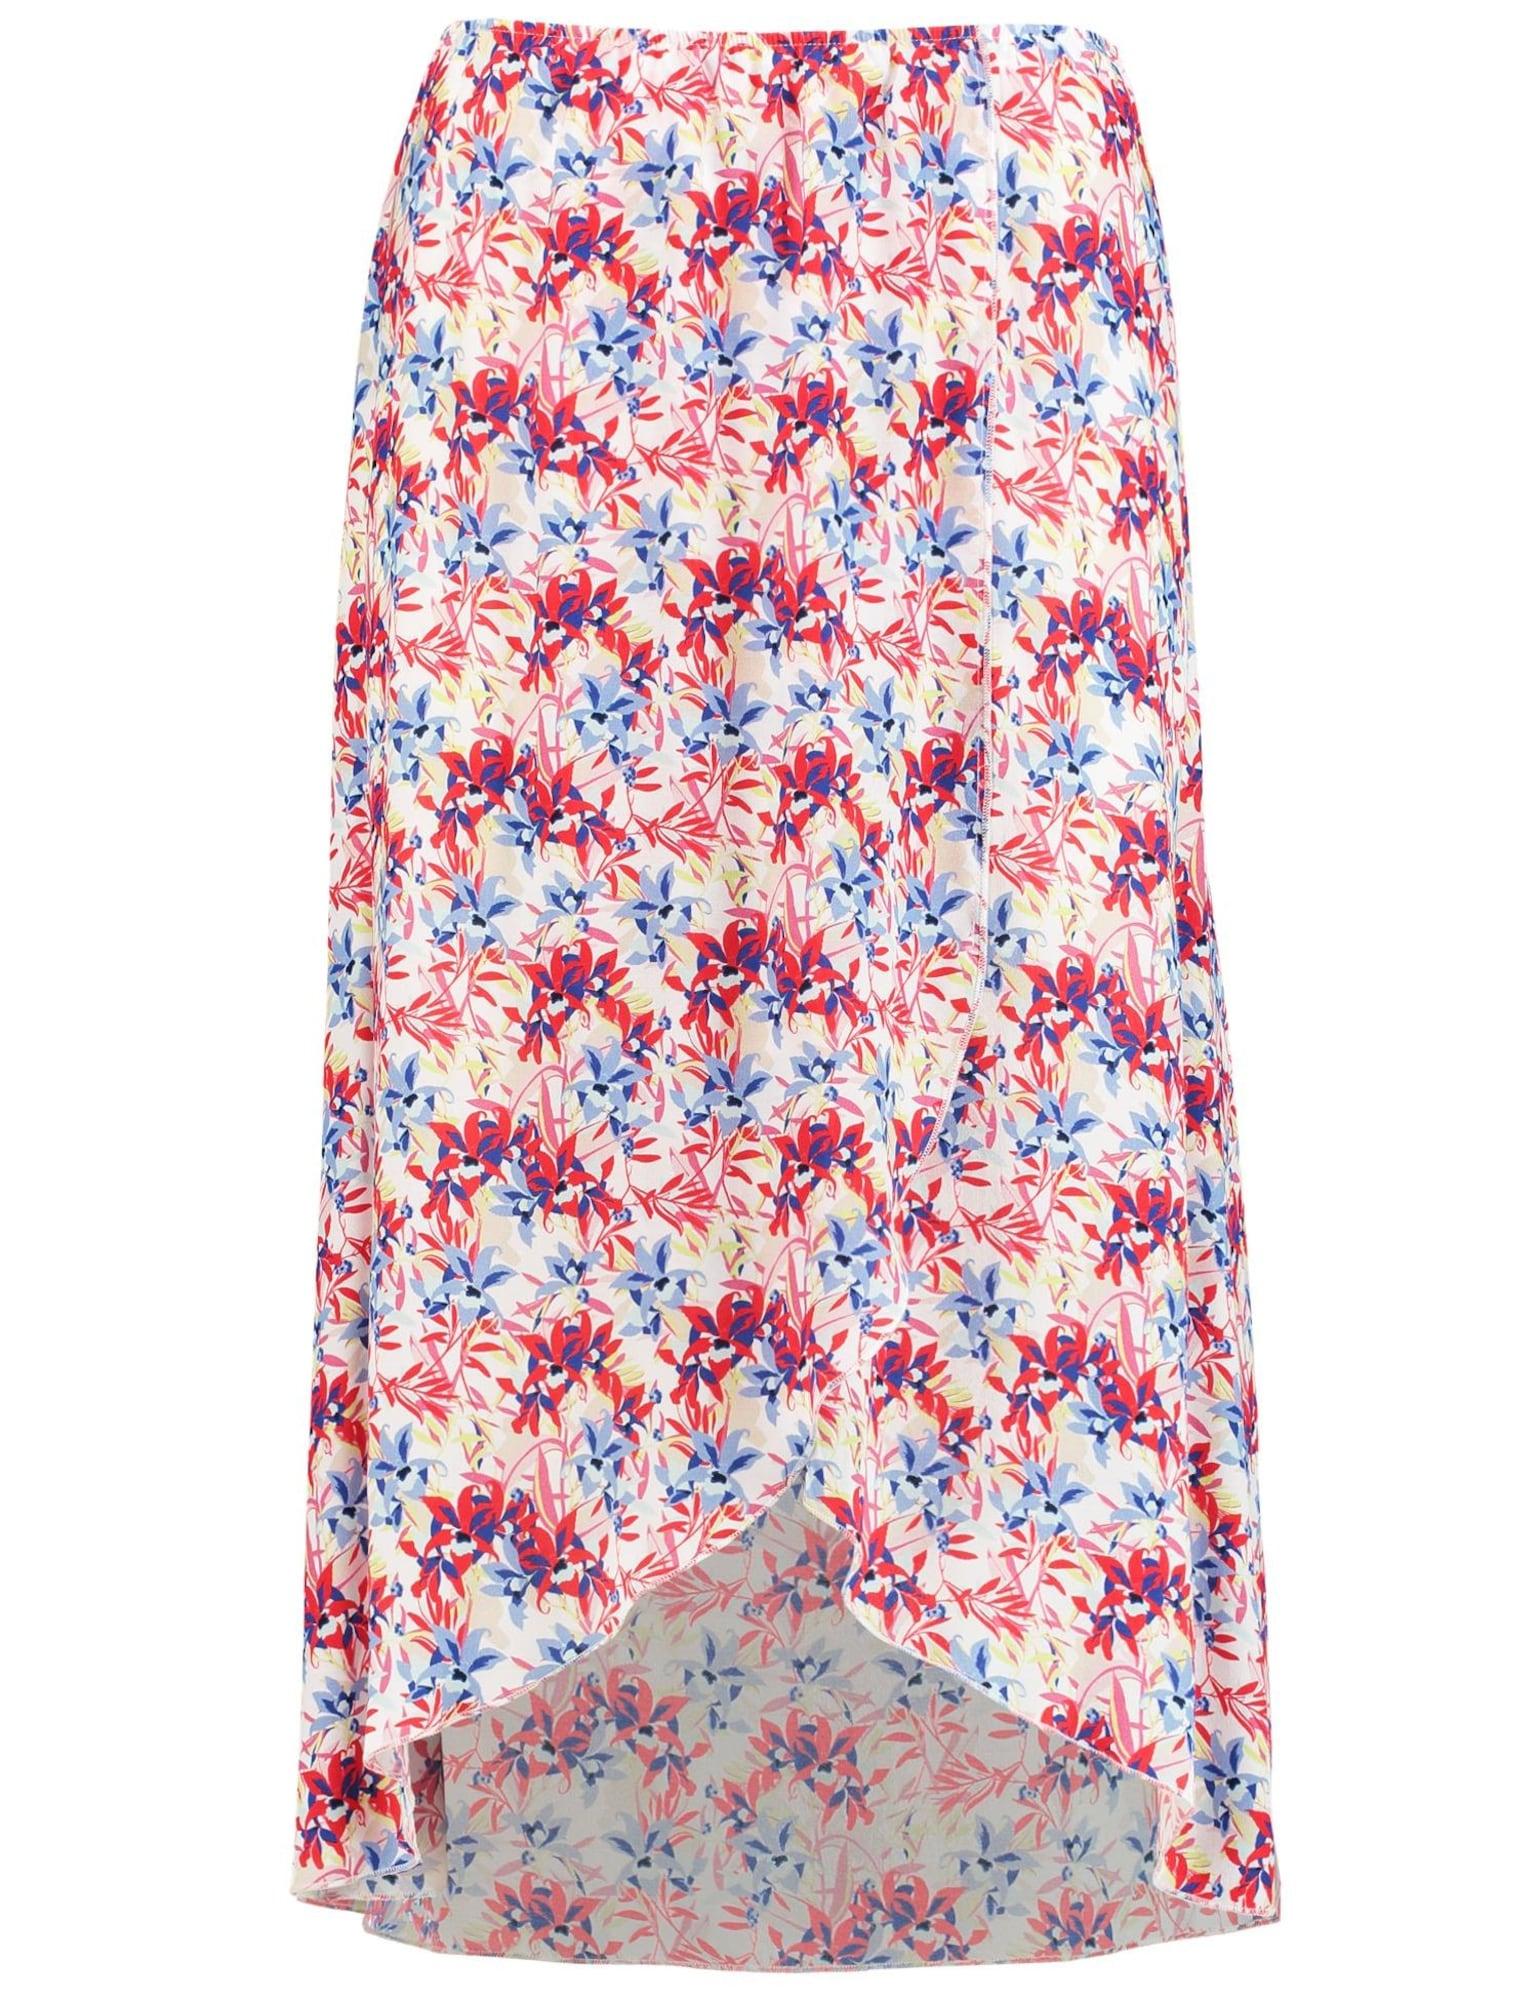 Sommerrock | Bekleidung > Röcke > Sommerröcke | Blau - Rot - Weiß | TAIFUN